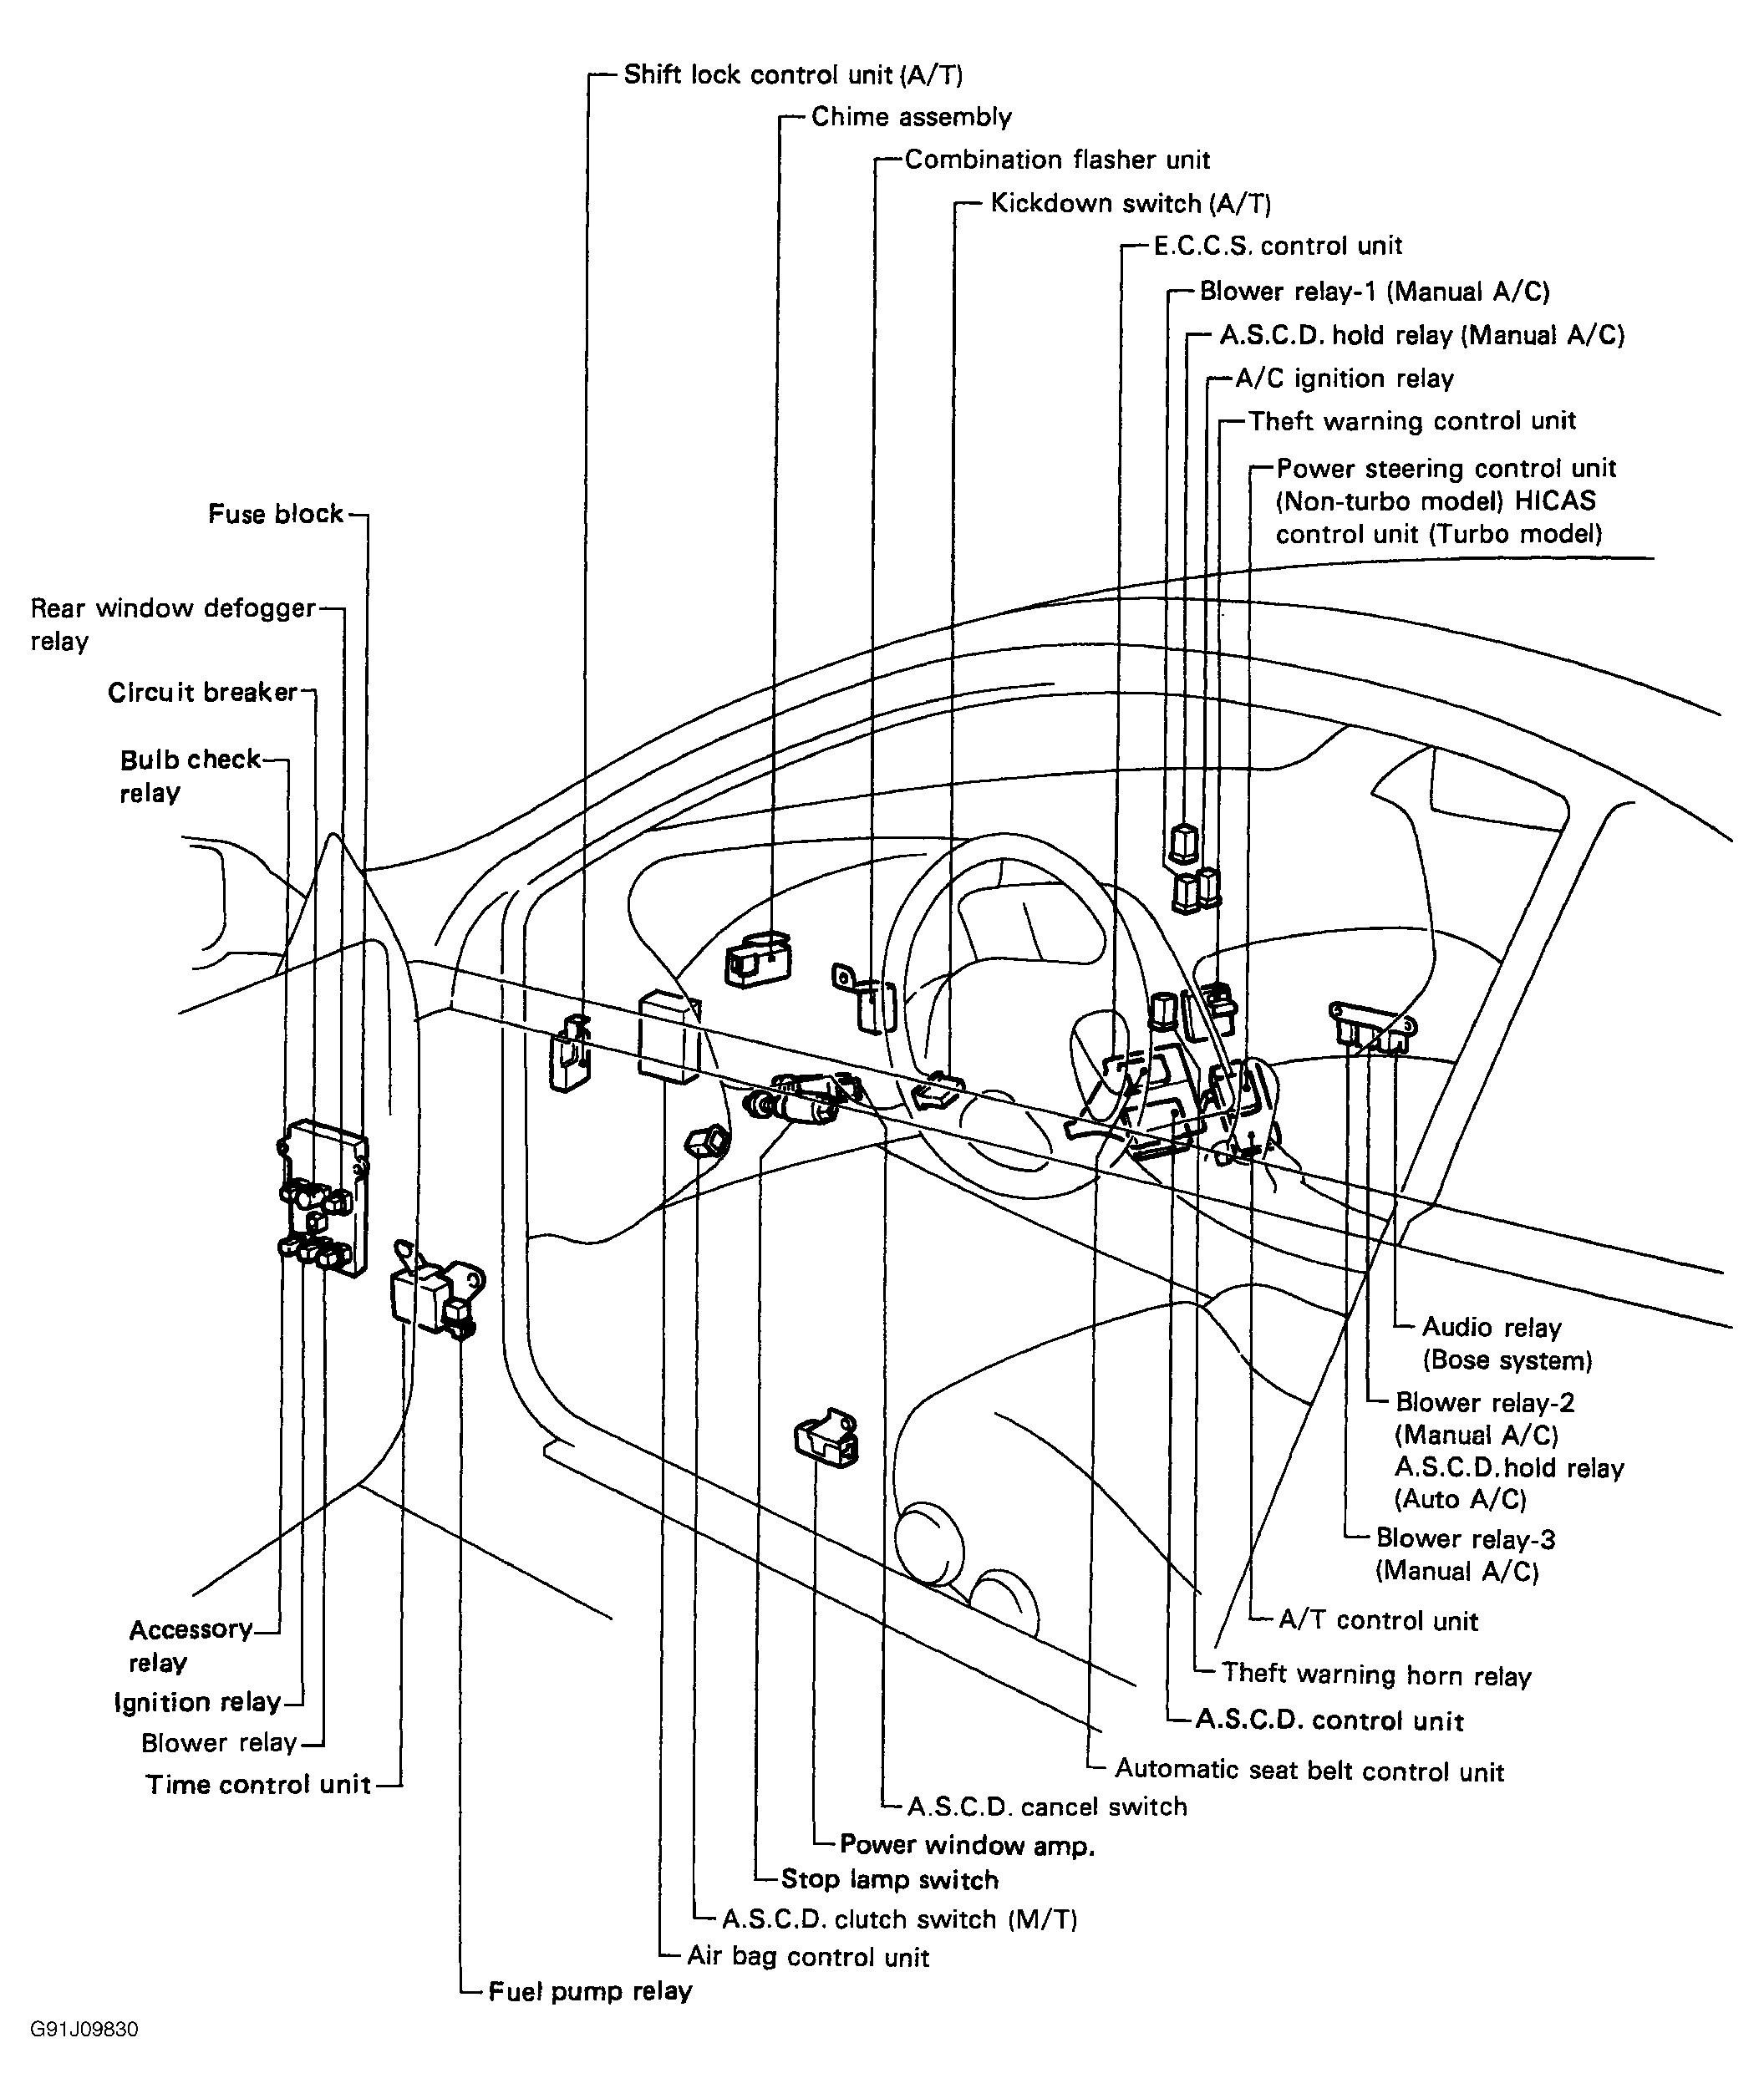 Frontier Stereo Wiring Diagram On Infiniti I30 Radio Wiring Diagram